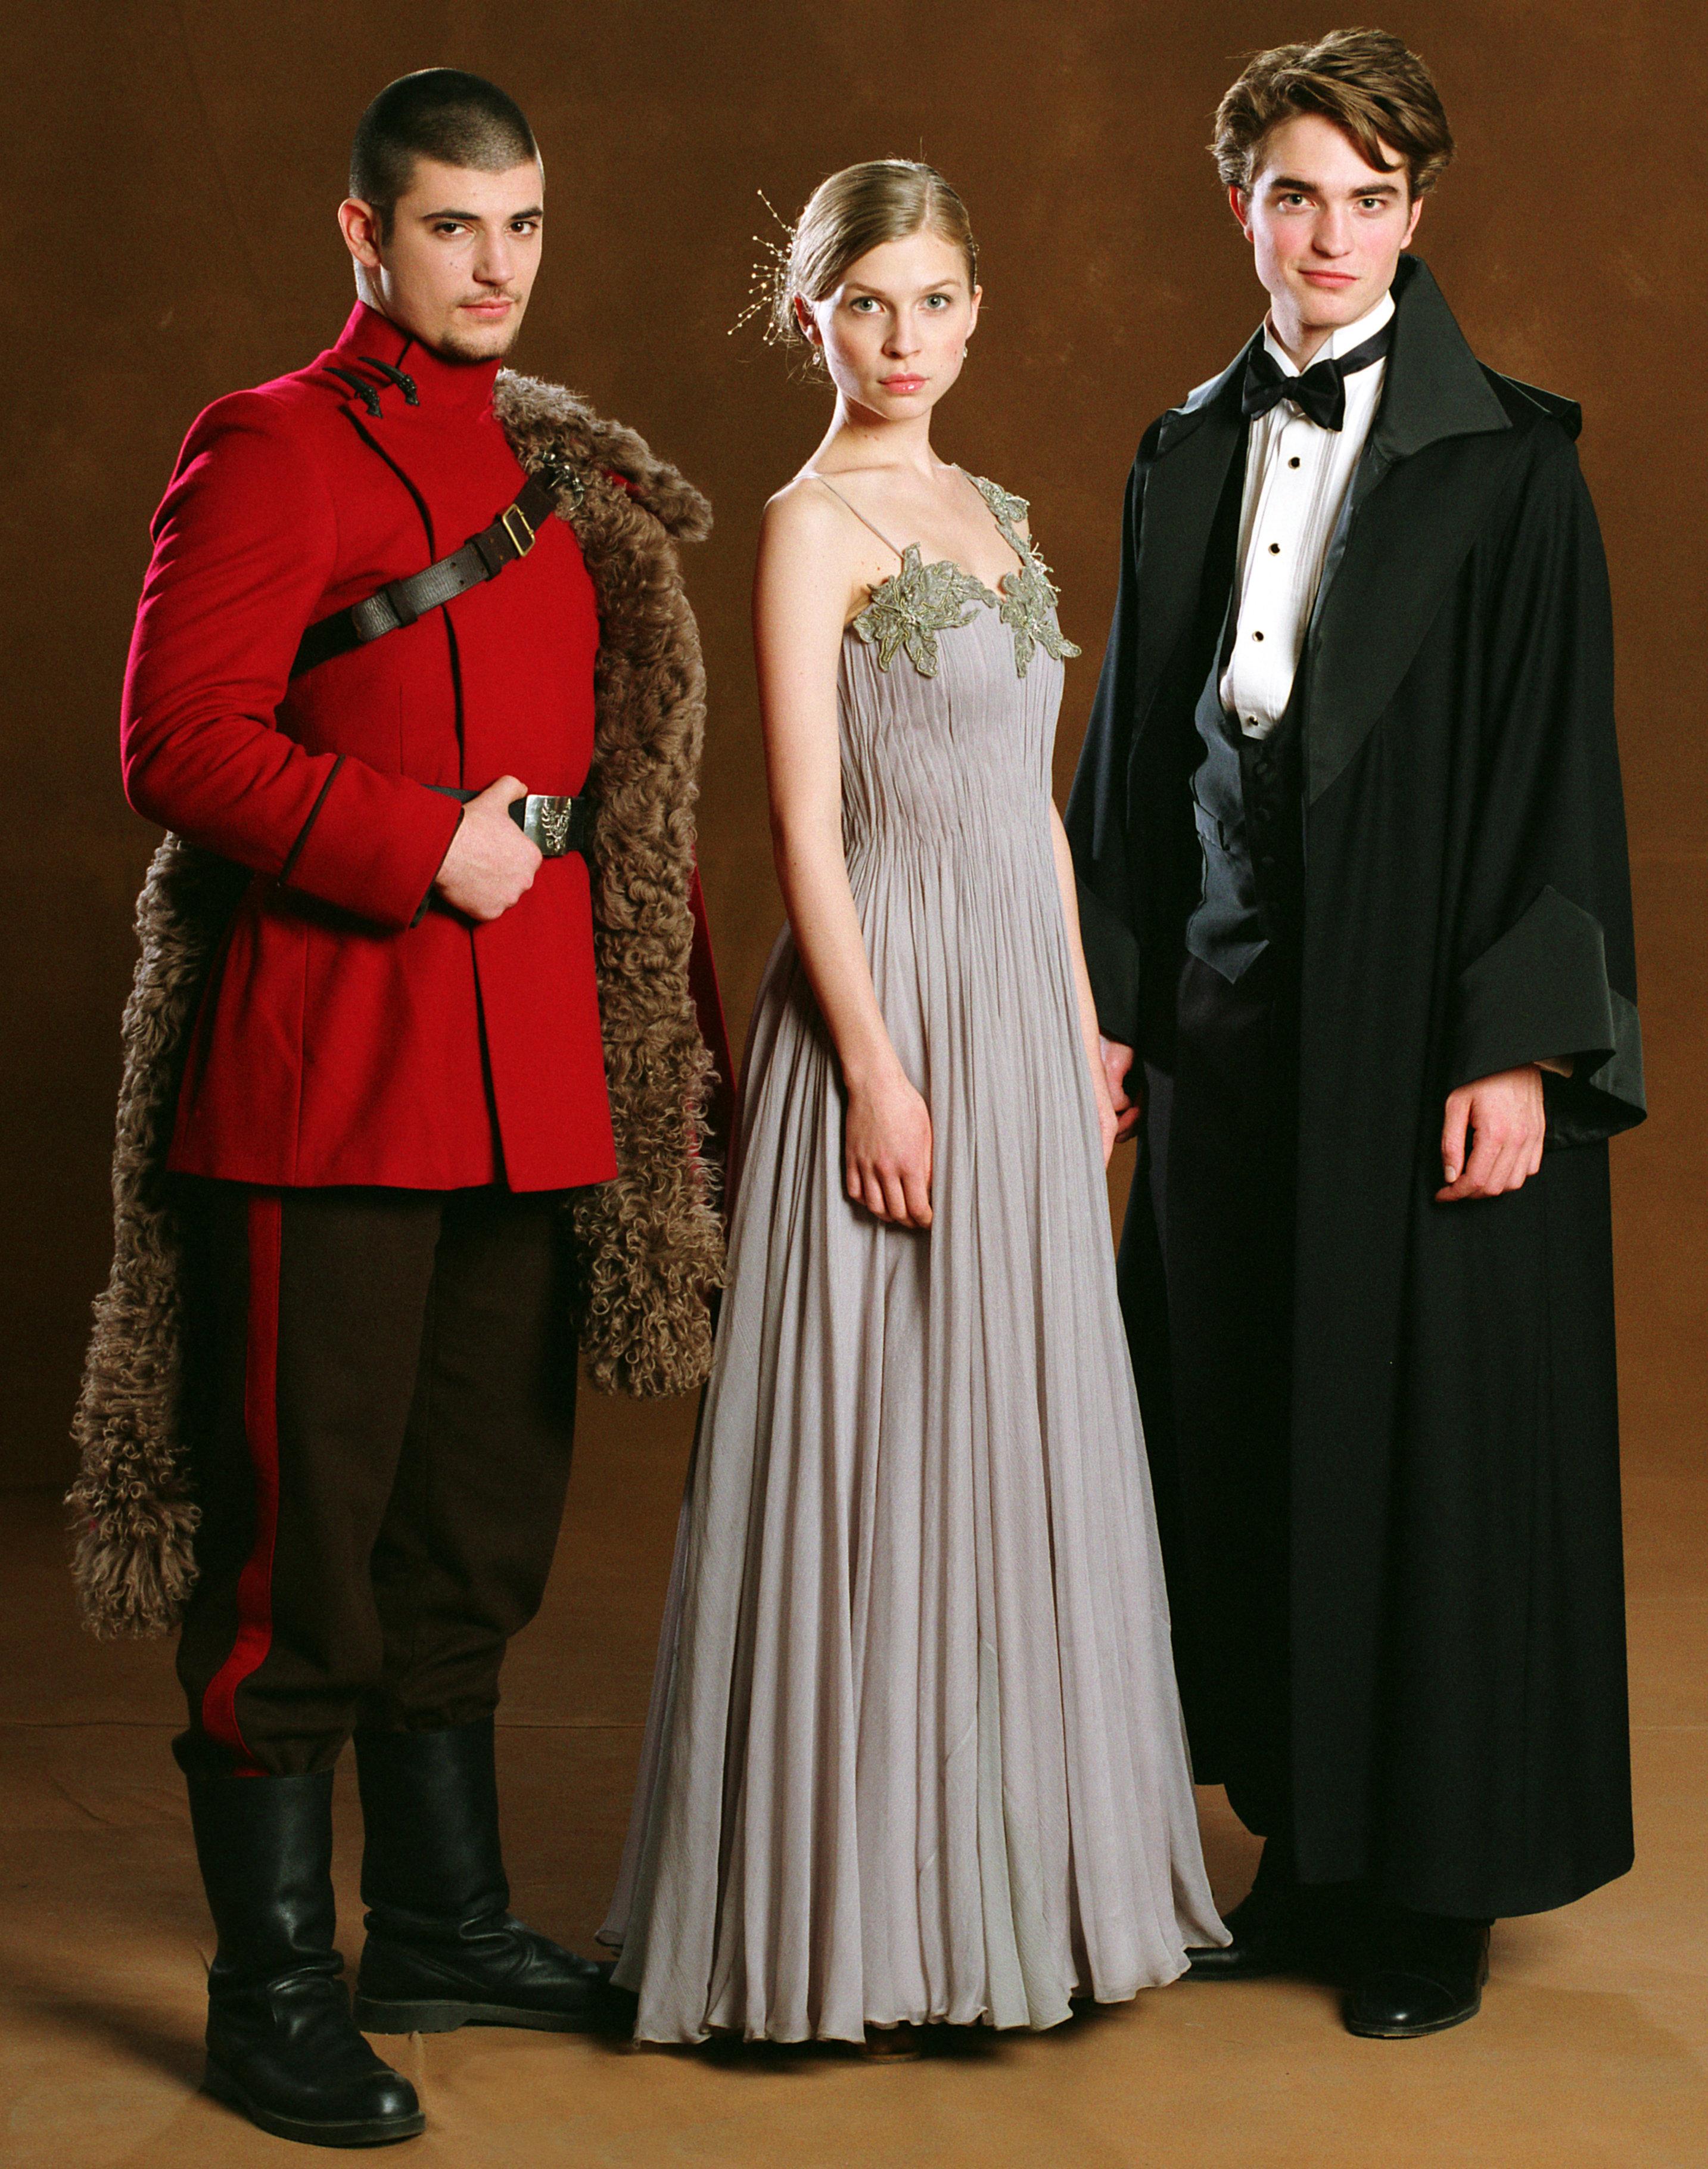 Dress Robes Harry Potter Wiki Fandom